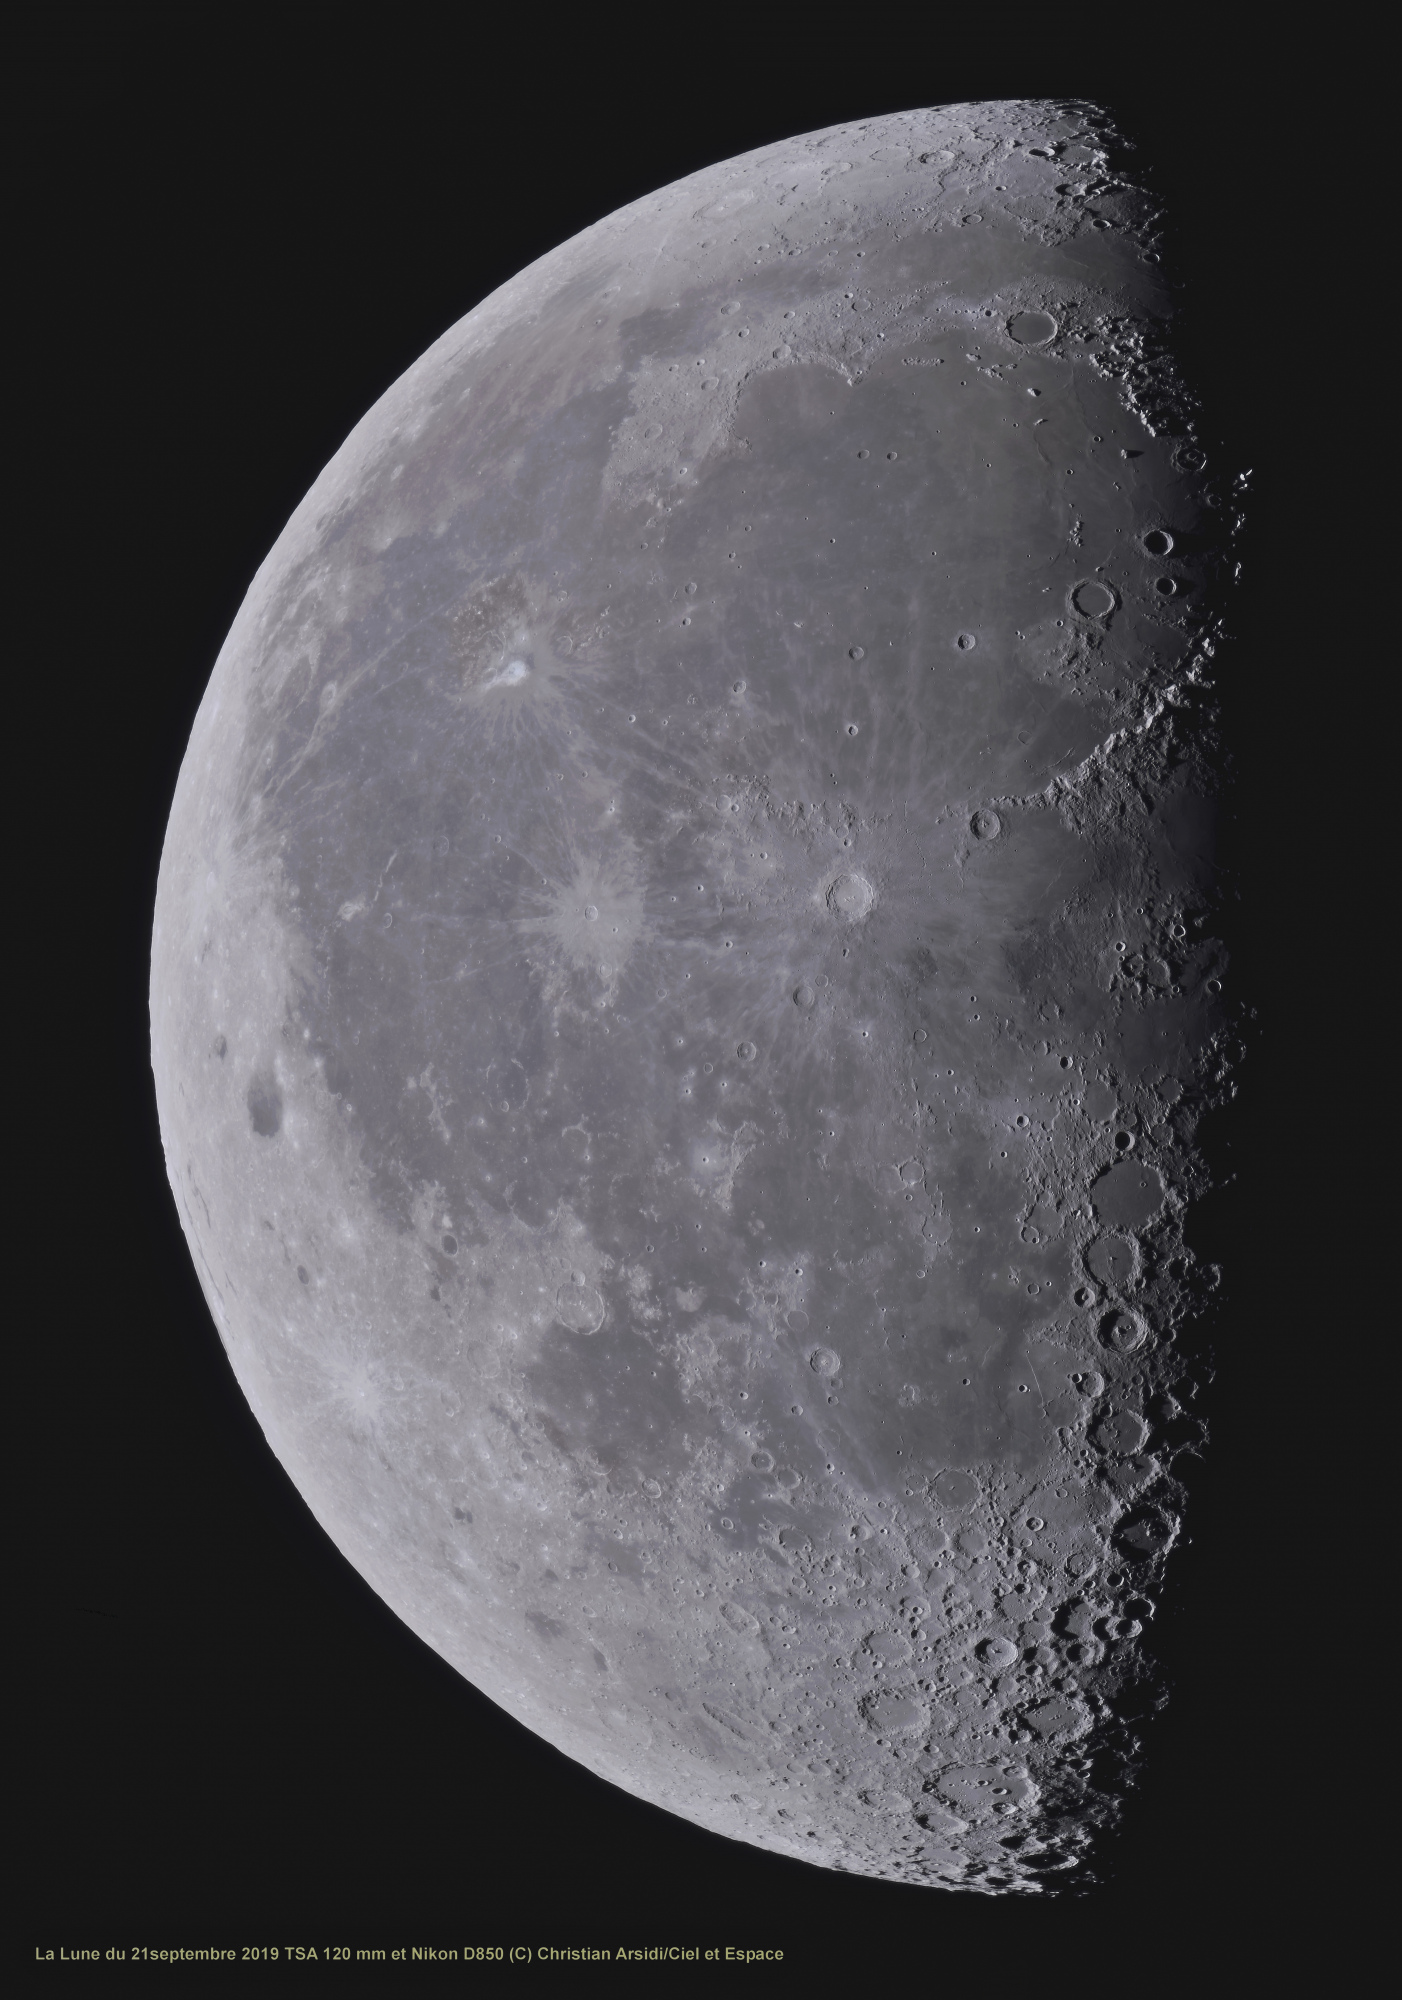 La Lune 30  images V3 traitée_DxO-1 1 BV CA 100% recadrée JPEG.jpg